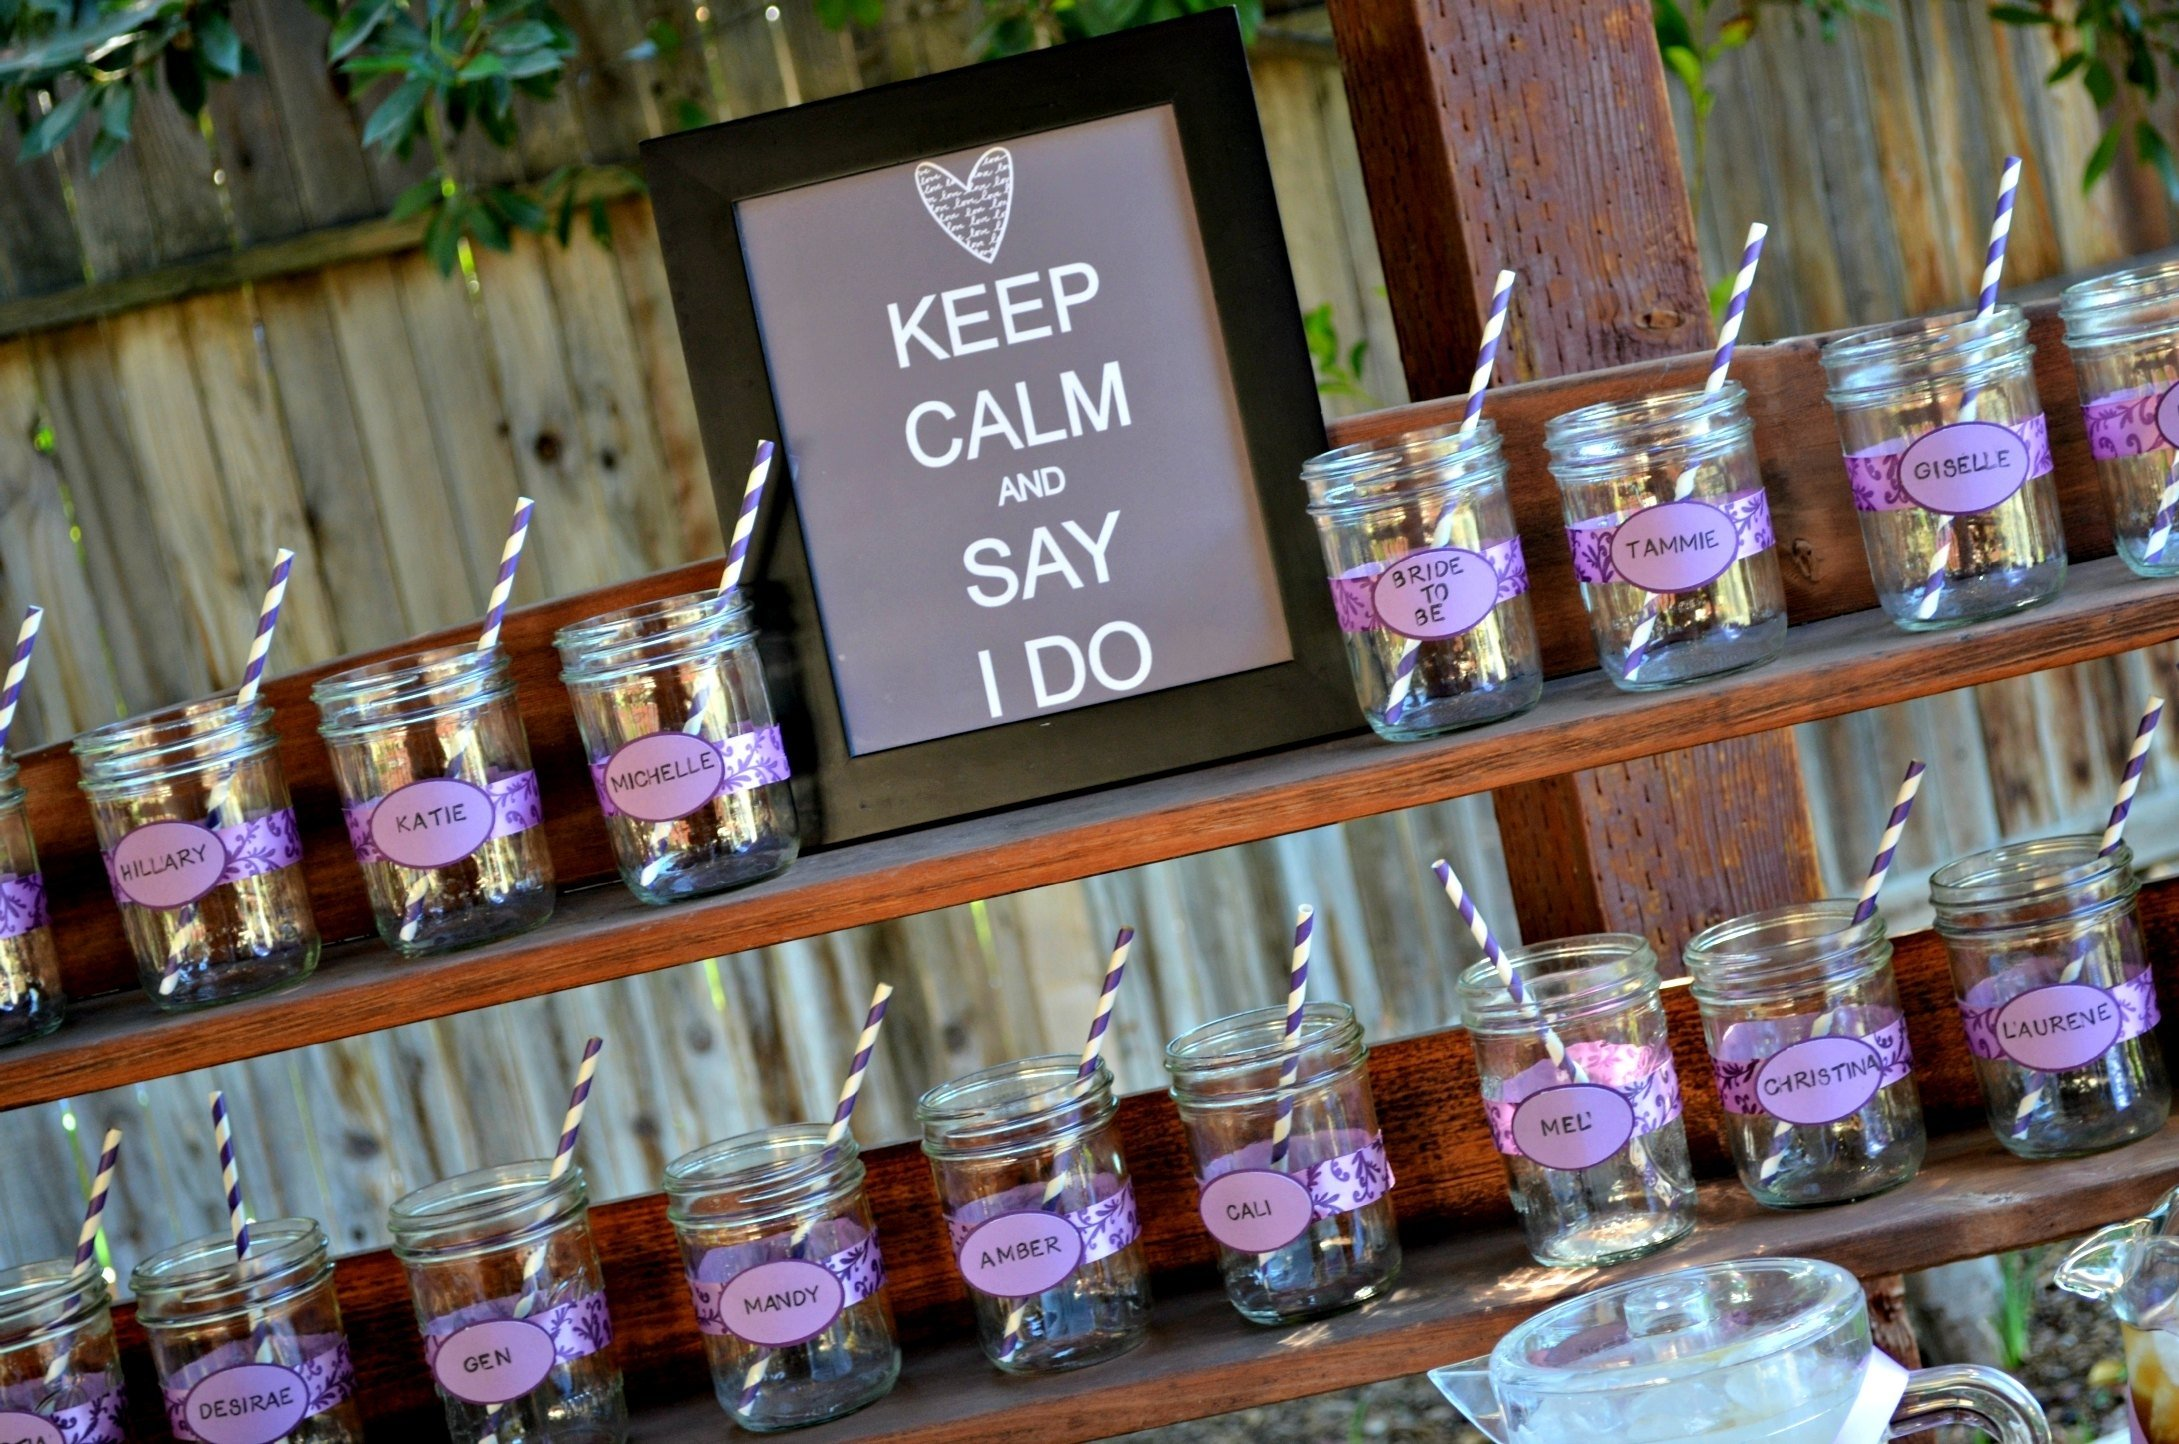 10 Unique Wedding Shower Ideas For Couples photo bridal shower games kitchen bridal image 1 2021